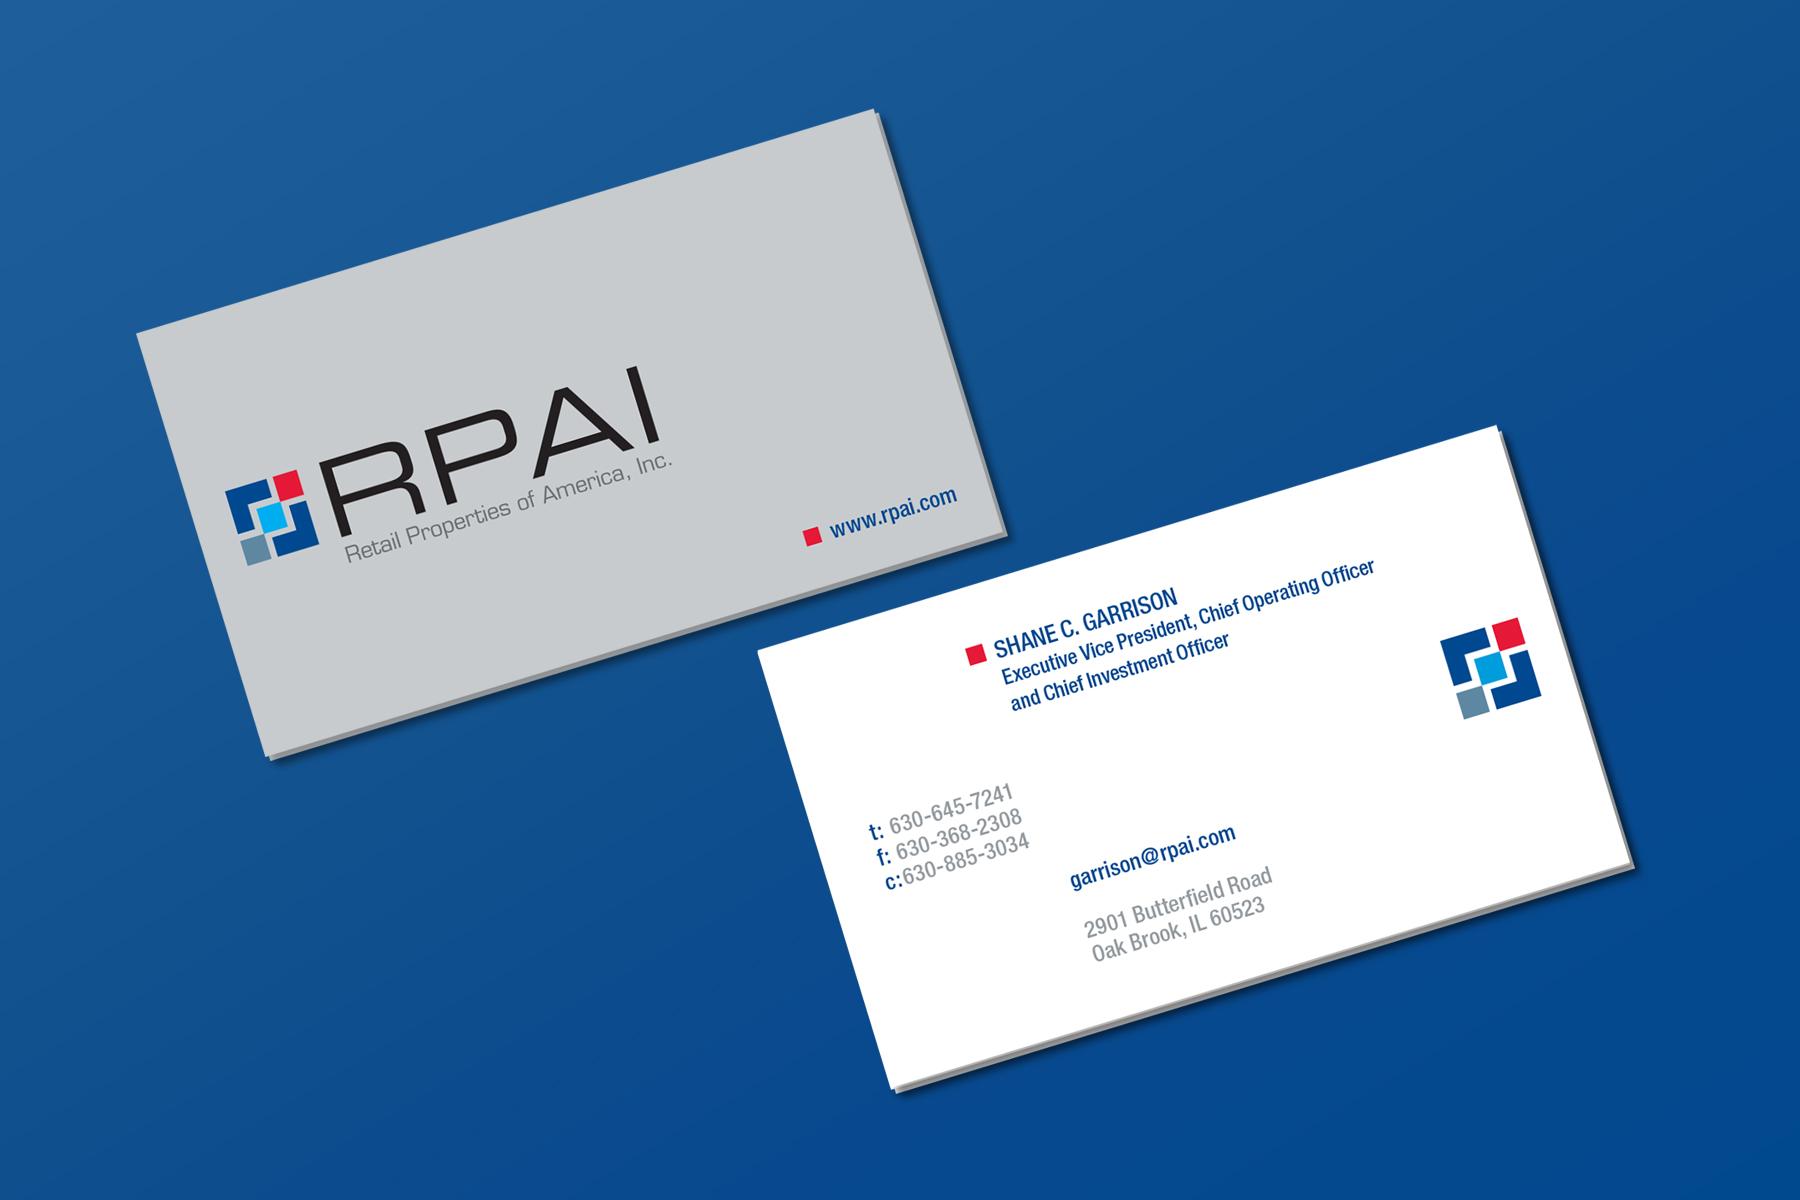 RPAI-BC_web-01.jpg